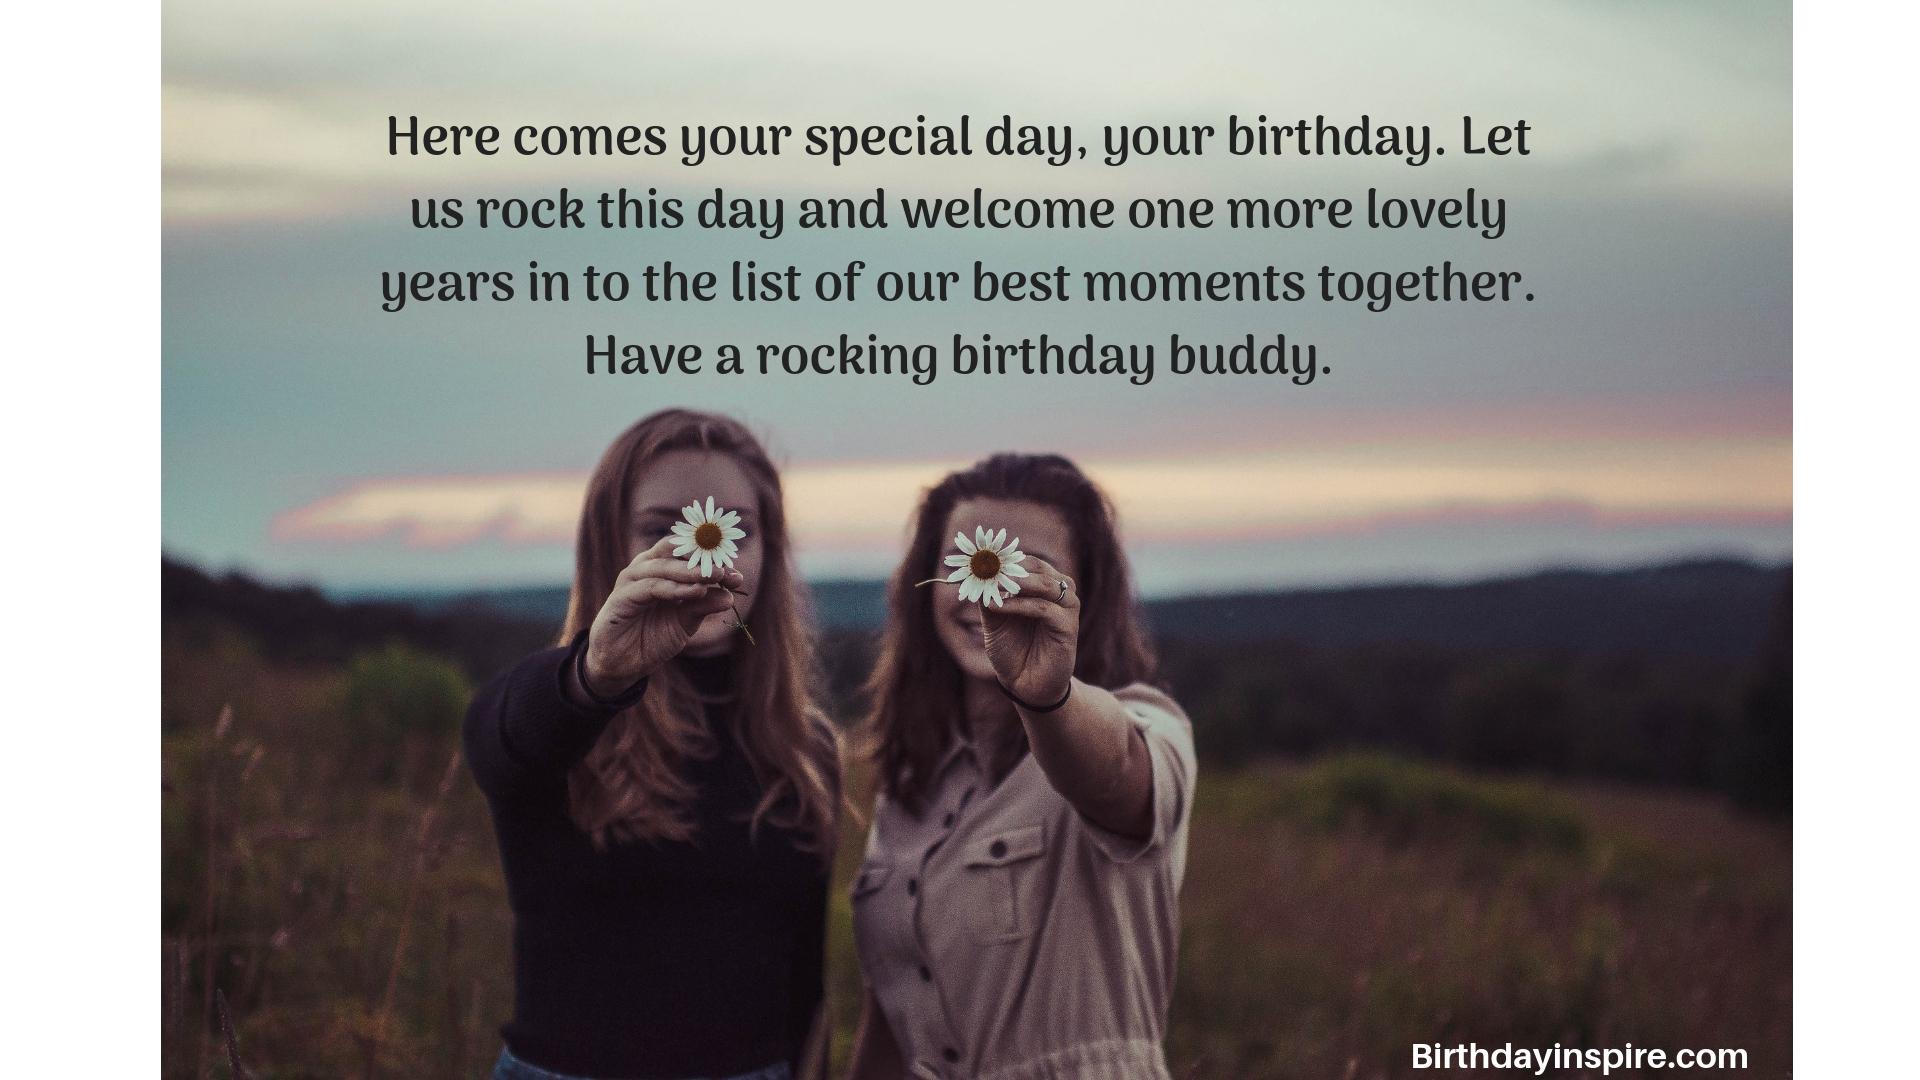 touching birthday wishes for best friendbirthday inspire